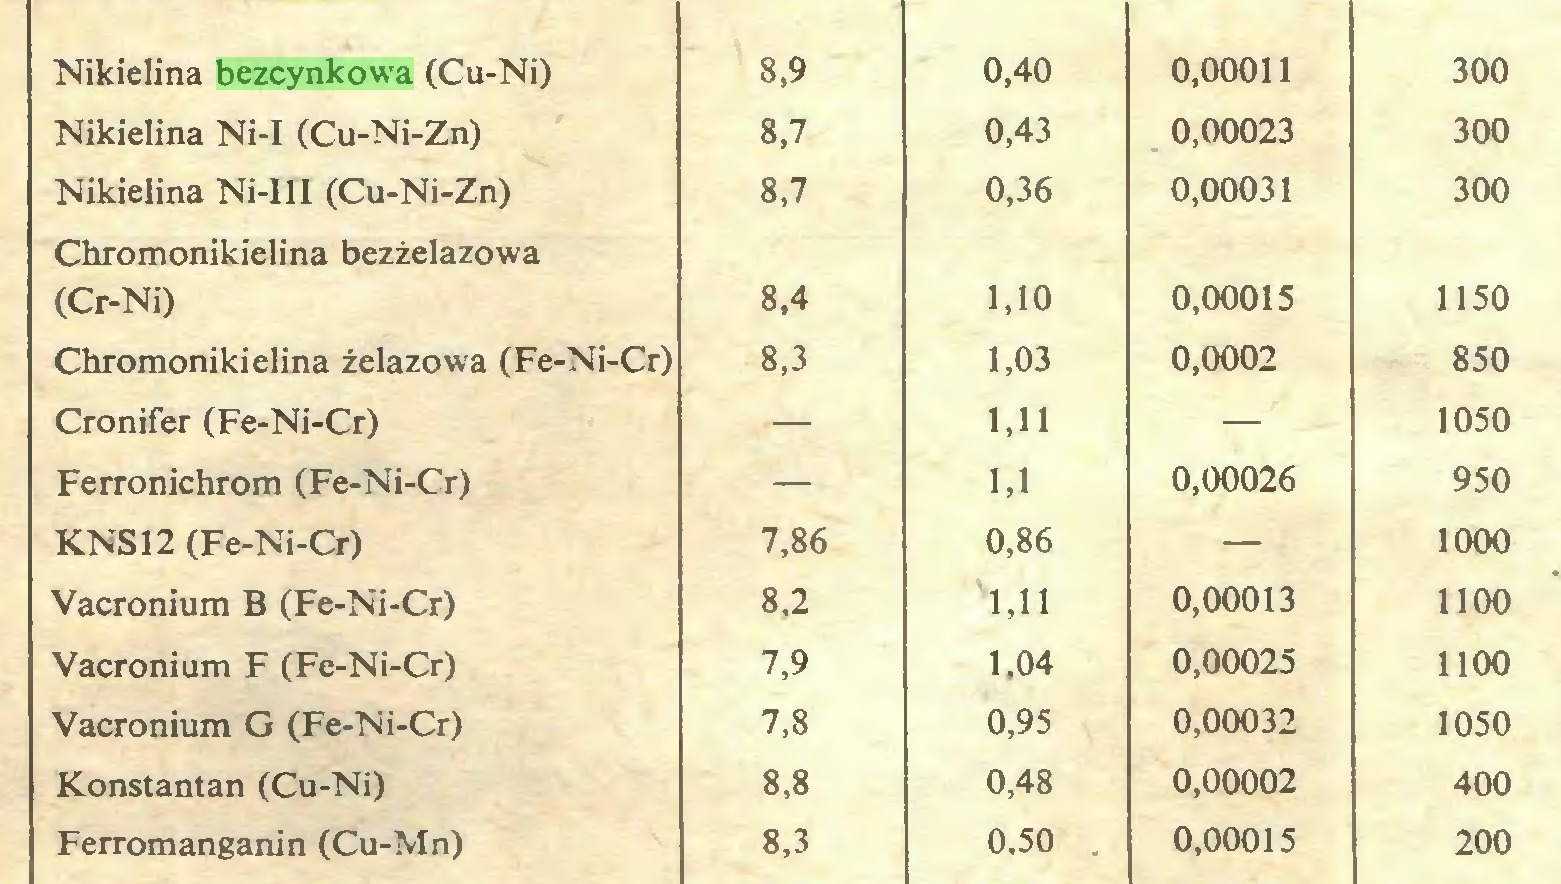 (...) Nikielina bezcynkowa (Cu-Ni) 8,9 0,40 0,00011 300 Nikielina Ni-I (Cu-Ni-Zn) 8,7 0,43 0,00023 300 Nikielina Ni-III (Cu-Ni-Zn) 8,7 0,36 0,00031 300 Chromonikielina bezżelazowa (Cr-Ni) 8,4 1,10 0,00015 1150 Chromonikielina żelazowa (Fe-Ni-Cr) 8,3 1,03 0,0002 850 Cronifer (Fe-Ni-Cr) — 1,11 — 1050 Ferronichrom (Fe-Ni-Cr) — 1,1 0,00026 950 KNS12 (Fe-Ni-Cr) 7,86 0,86 — 1000 Vacronium B (Fe-Ni-Cr) 8,2 '1,11 0,00013 1100 Vacronium F (Fe-Ni-Cr) 7,9 1,04 0,00025 1100 Vacronium G (Fe-Ni-Cr) 7,8 0,95 0,00032 1050 Konstantan (Cu-Ni) 8,8 0,48 0,00002 400 Ferromanganin (Cu-Mn) 8,3 0,50 . 0,00015 200...